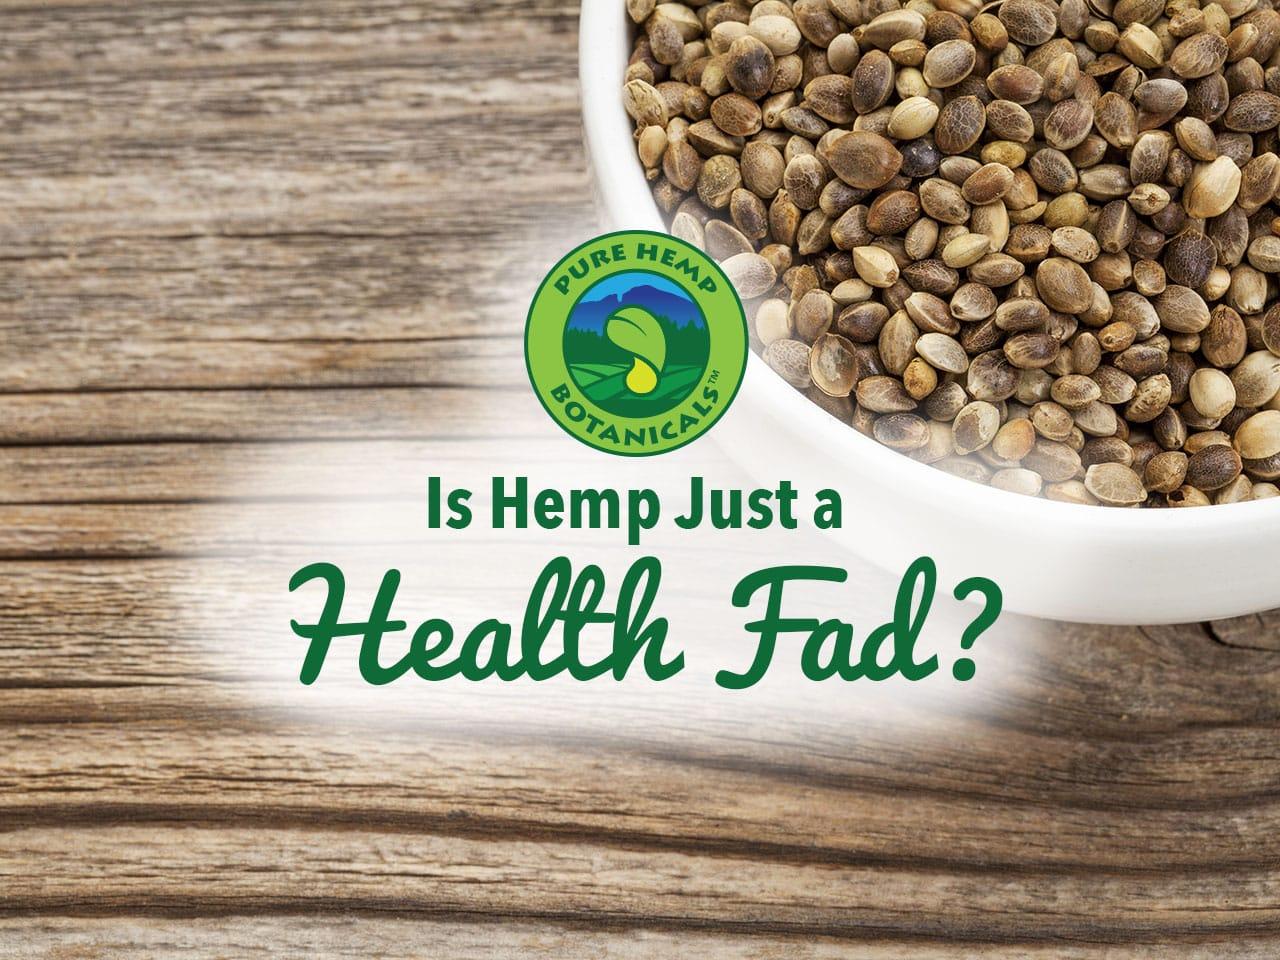 Is Hemp Just a Health Fad?